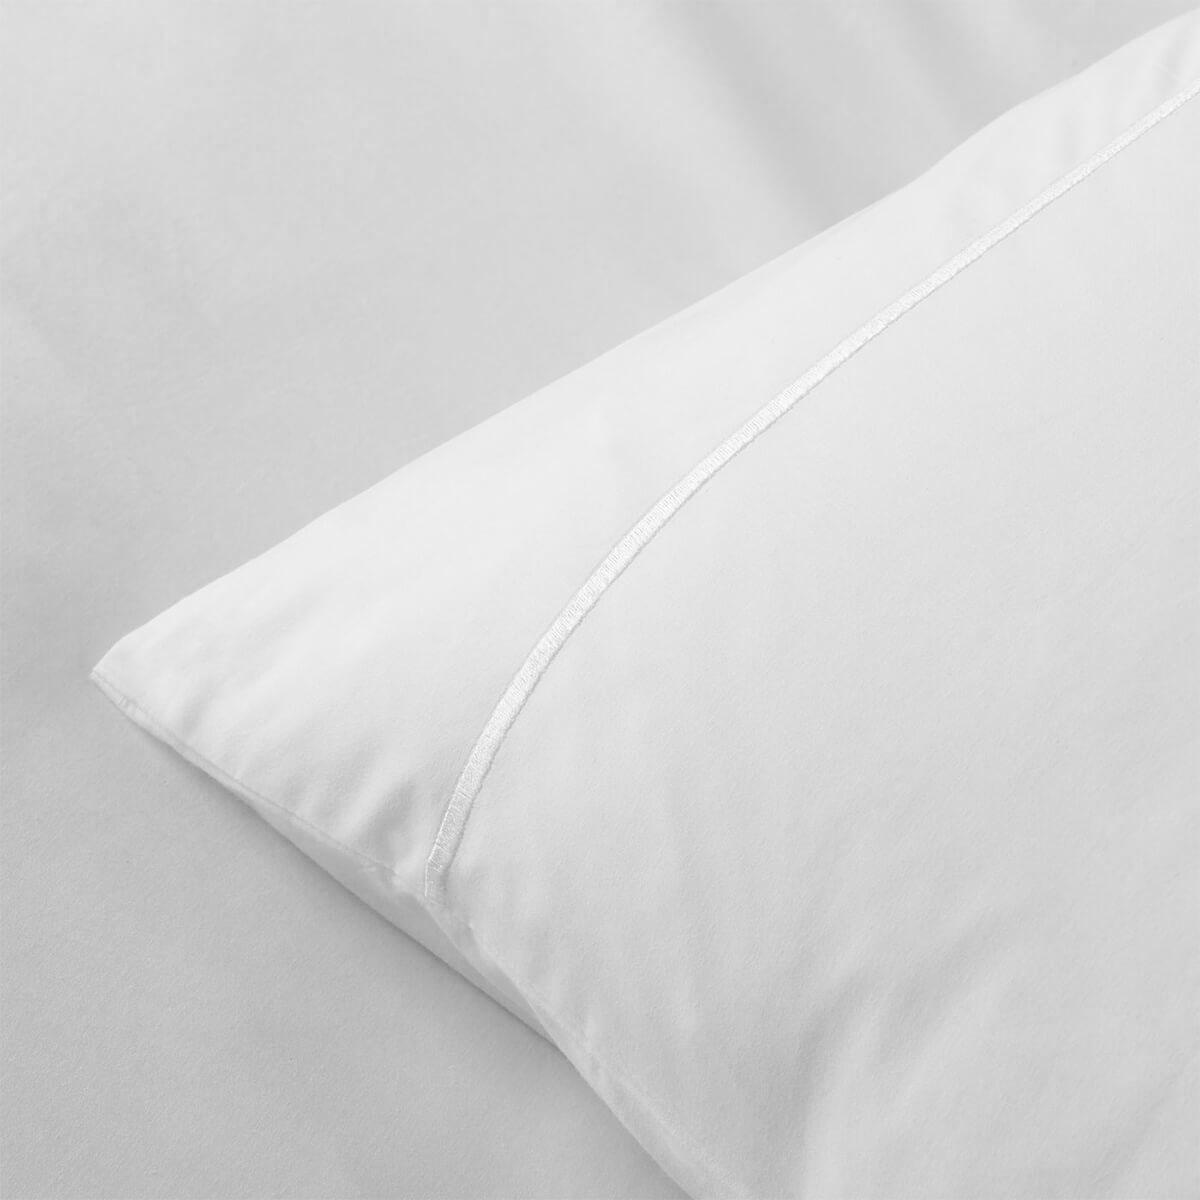 White 200 Thread Count Egyptian Cotton Superking Housewife Pillowcase Pair